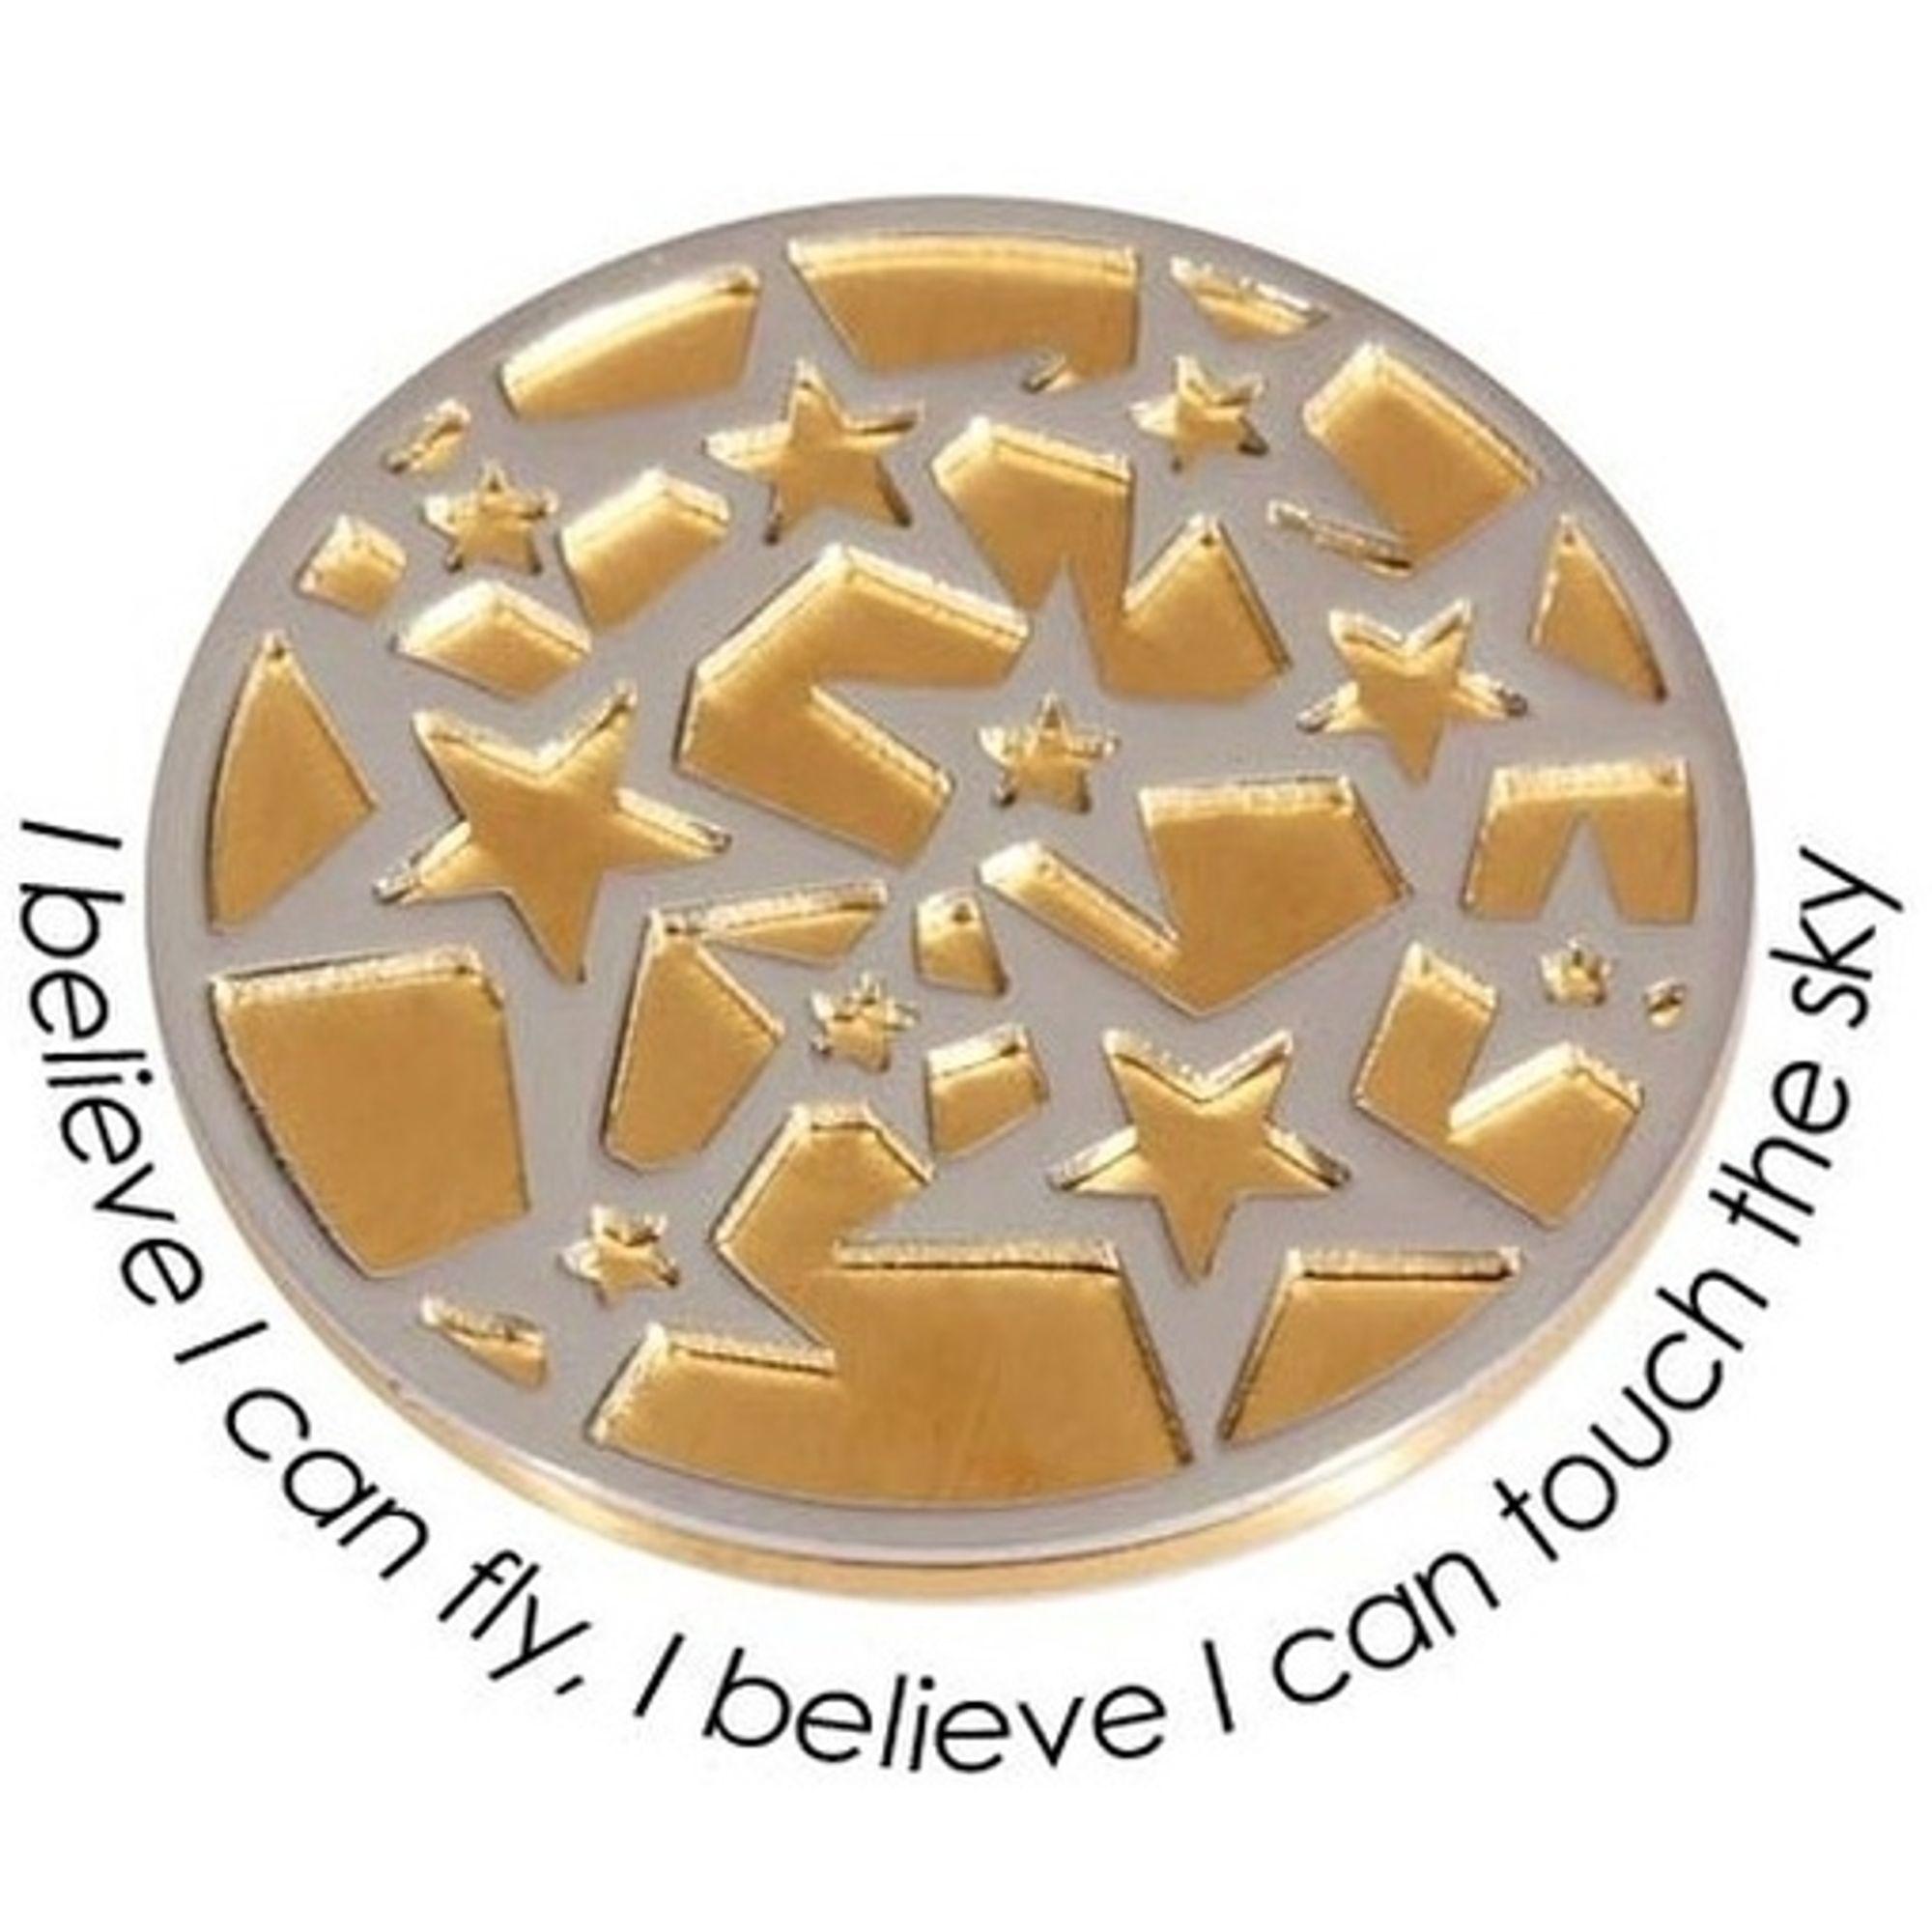 Quoins QMOD-05L-G Münze Higher dimension large Stern gold